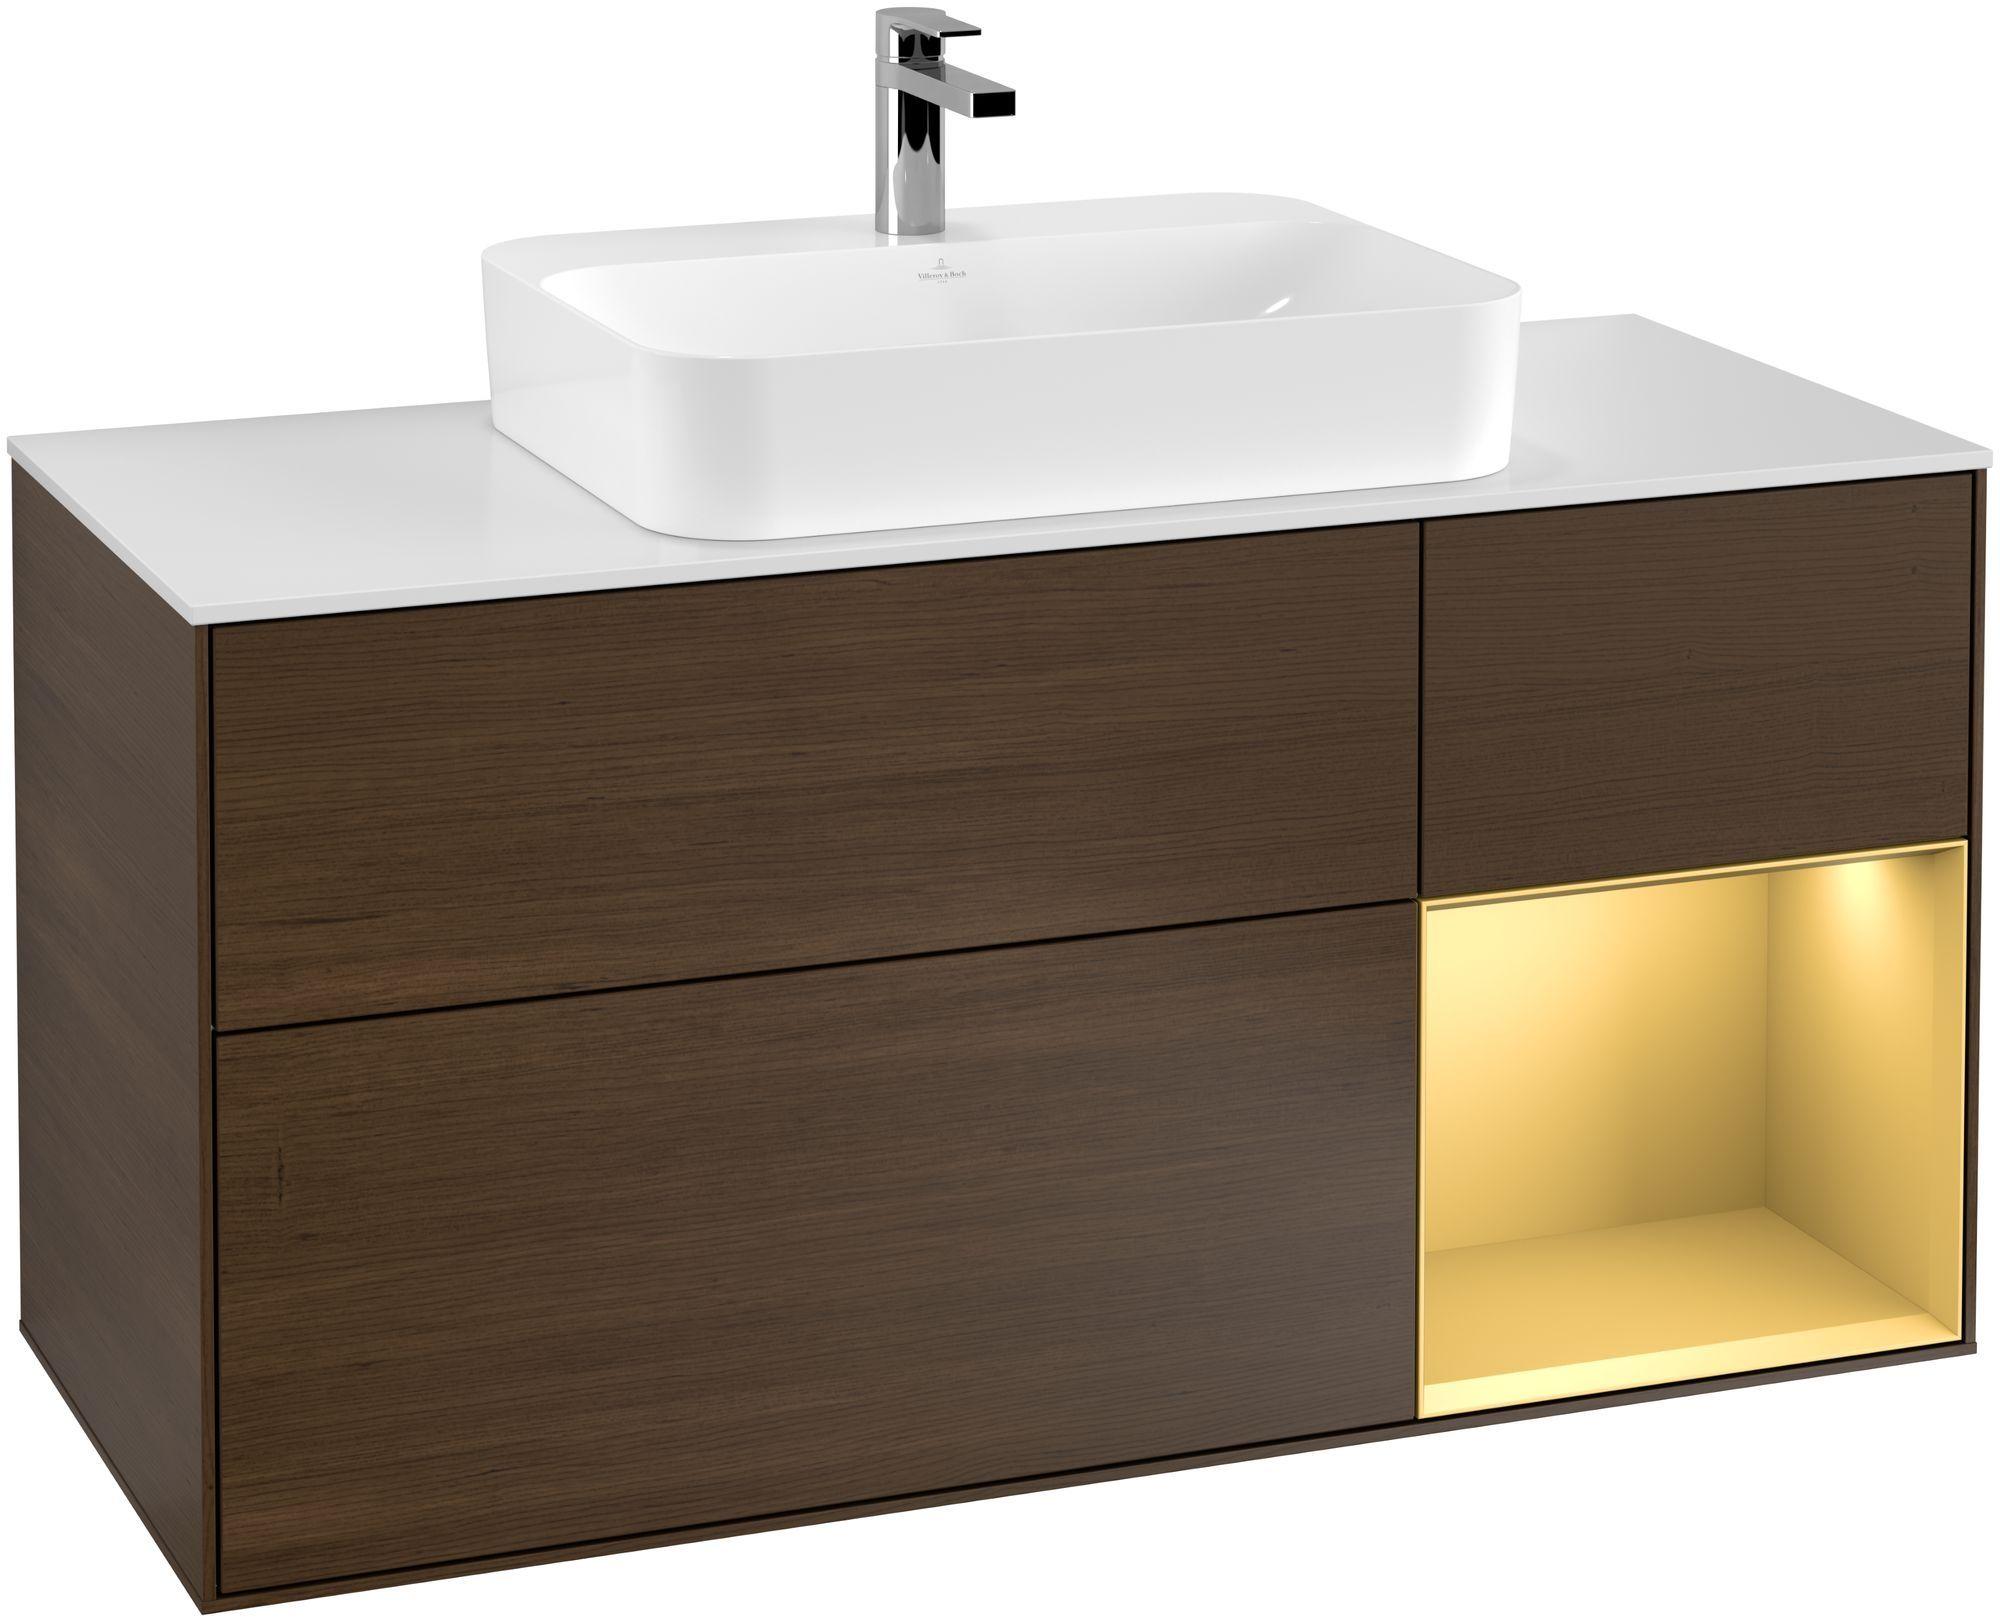 Villeroy & Boch Finion G42 Waschtischunterschrank mit Regalelement 3 Auszüge Waschtisch mittig LED-Beleuchtung B:120xH:60,3xT:50,1cm Front, Korpus: Walnut Veneer, Regal: Gold Matt, Glasplatte: White Matt G421HFGN